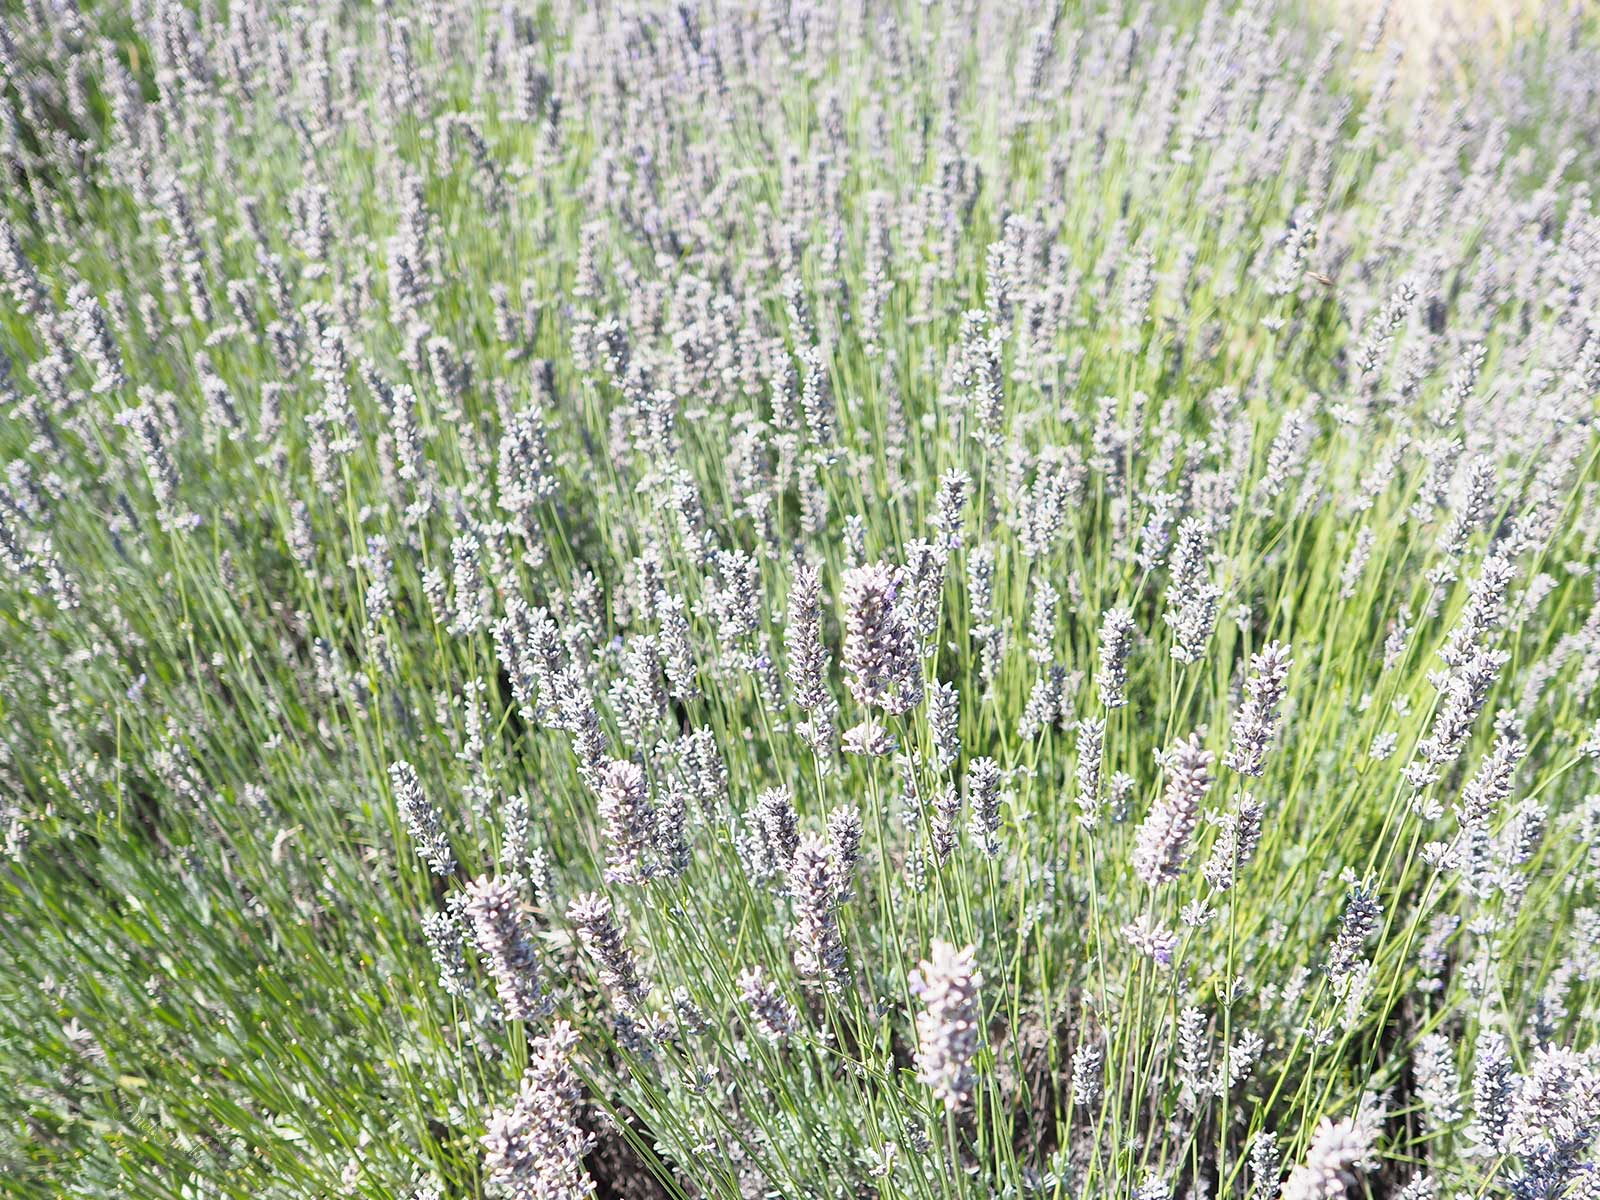 lavande fraîche jardin parfum naturel Valladolid laboutiquedemelimelo